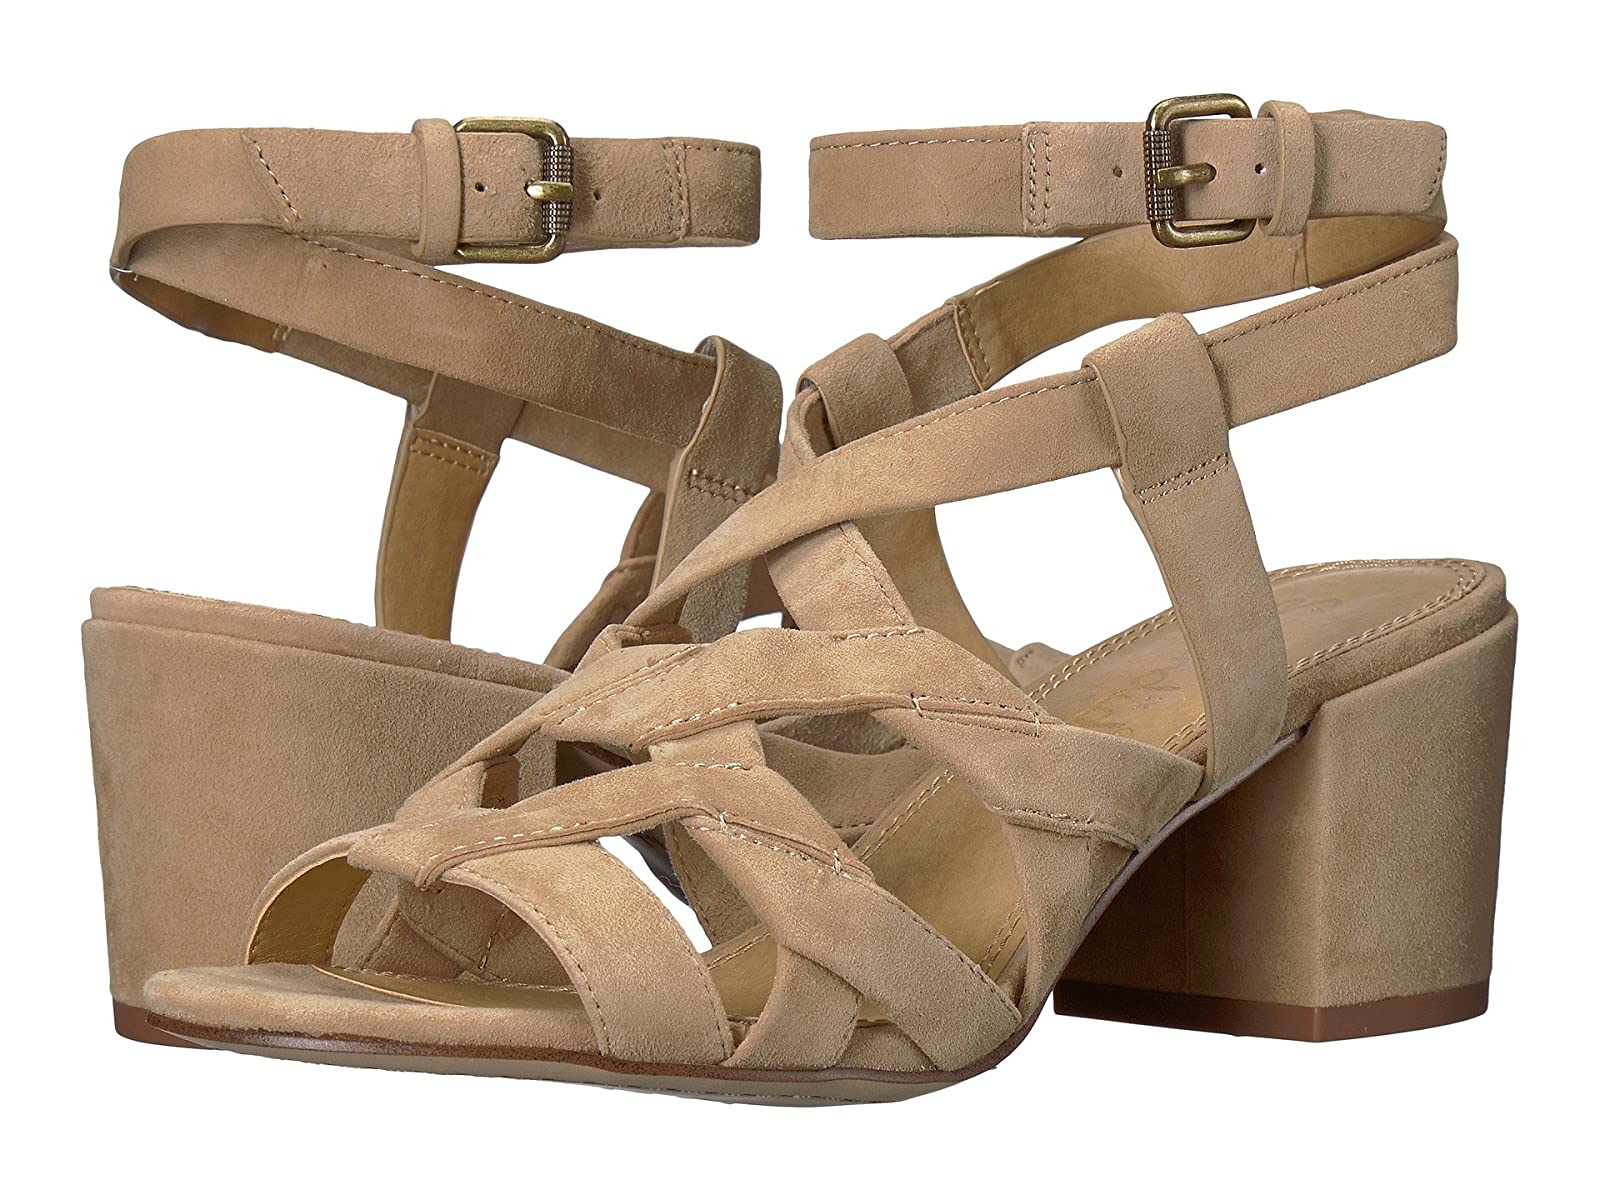 Splendid BarrymoreCheap and distinctive eye-catching shoes